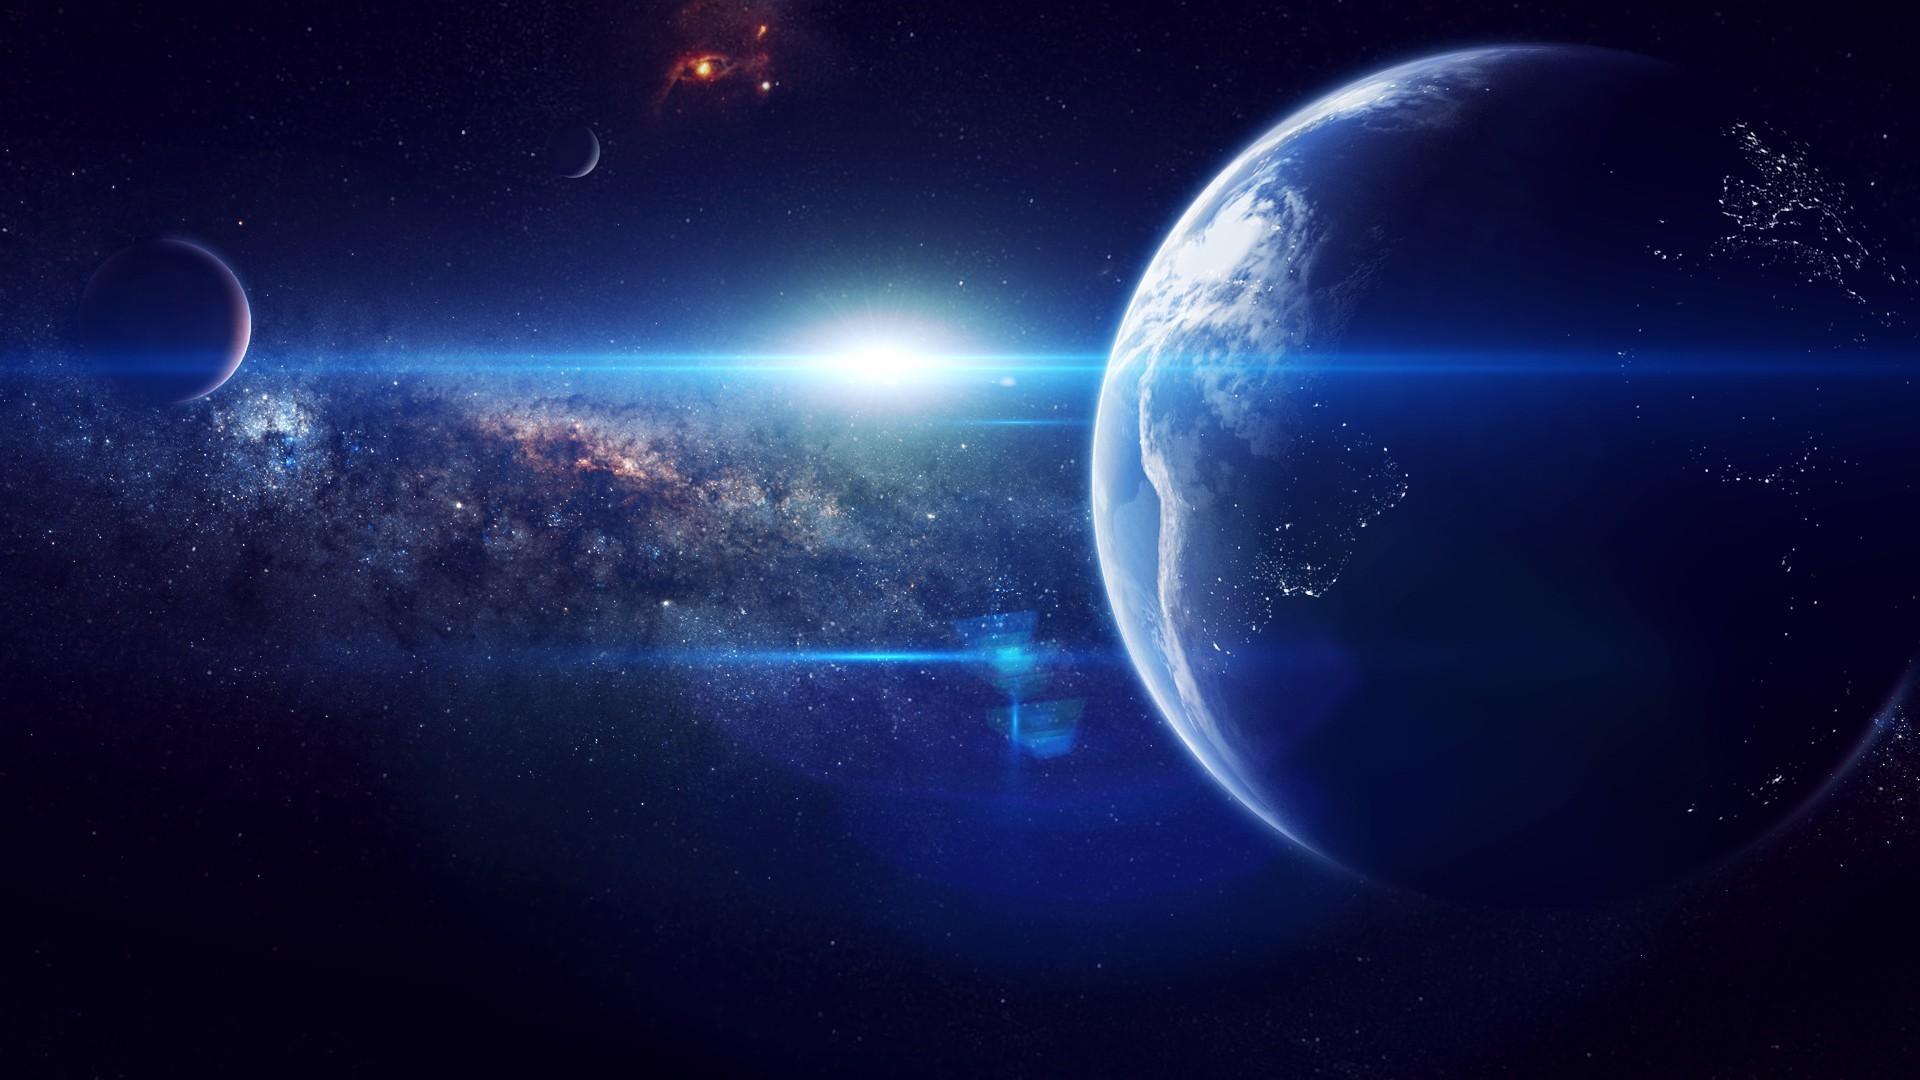 … outer e stars explosions planets earth supernova …